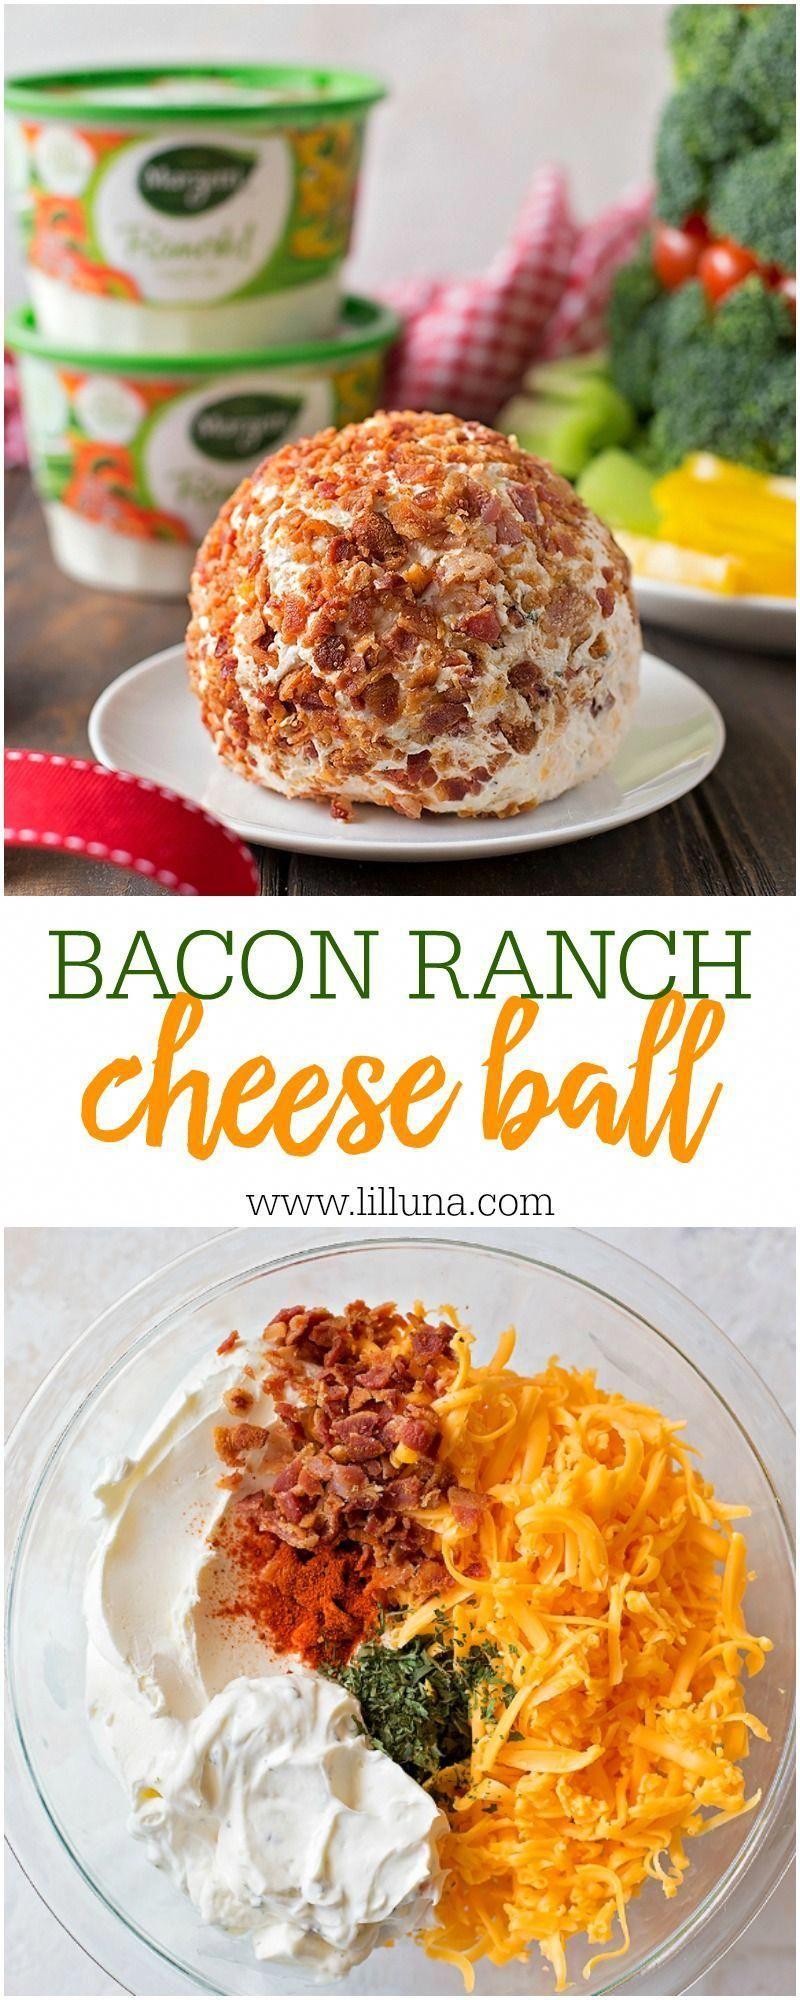 Bacon Ranch Käseball Rezept  VIDEO  Lil 39Luna Bacon Ranch Käseball Rezept  VIDEO  Lil Luna